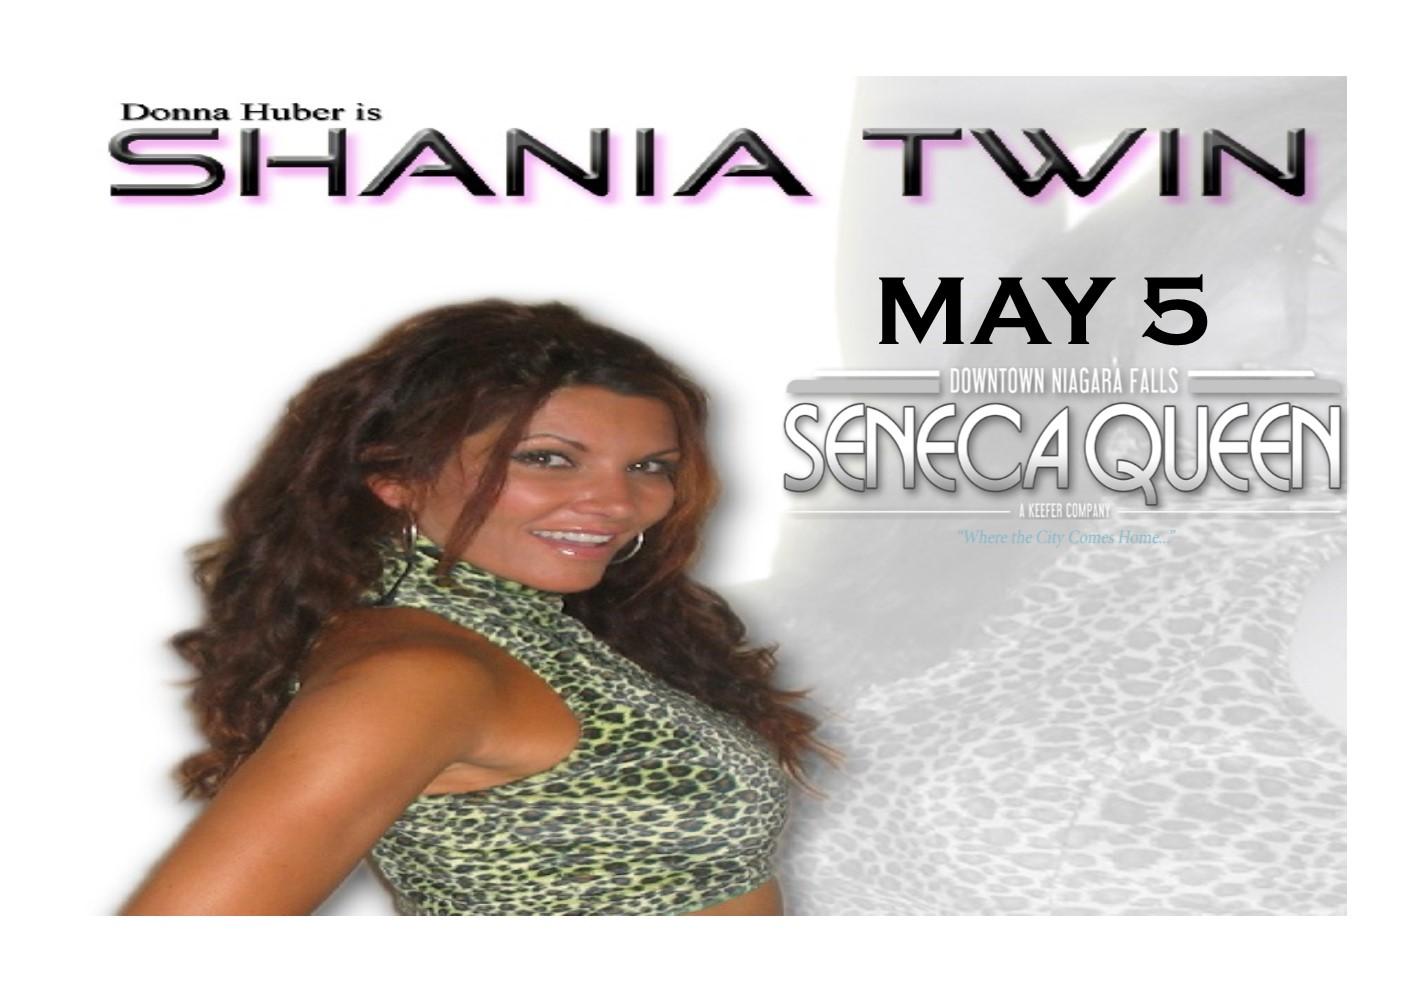 Shania Twin – The Ultimate Tribute to Shania Twain